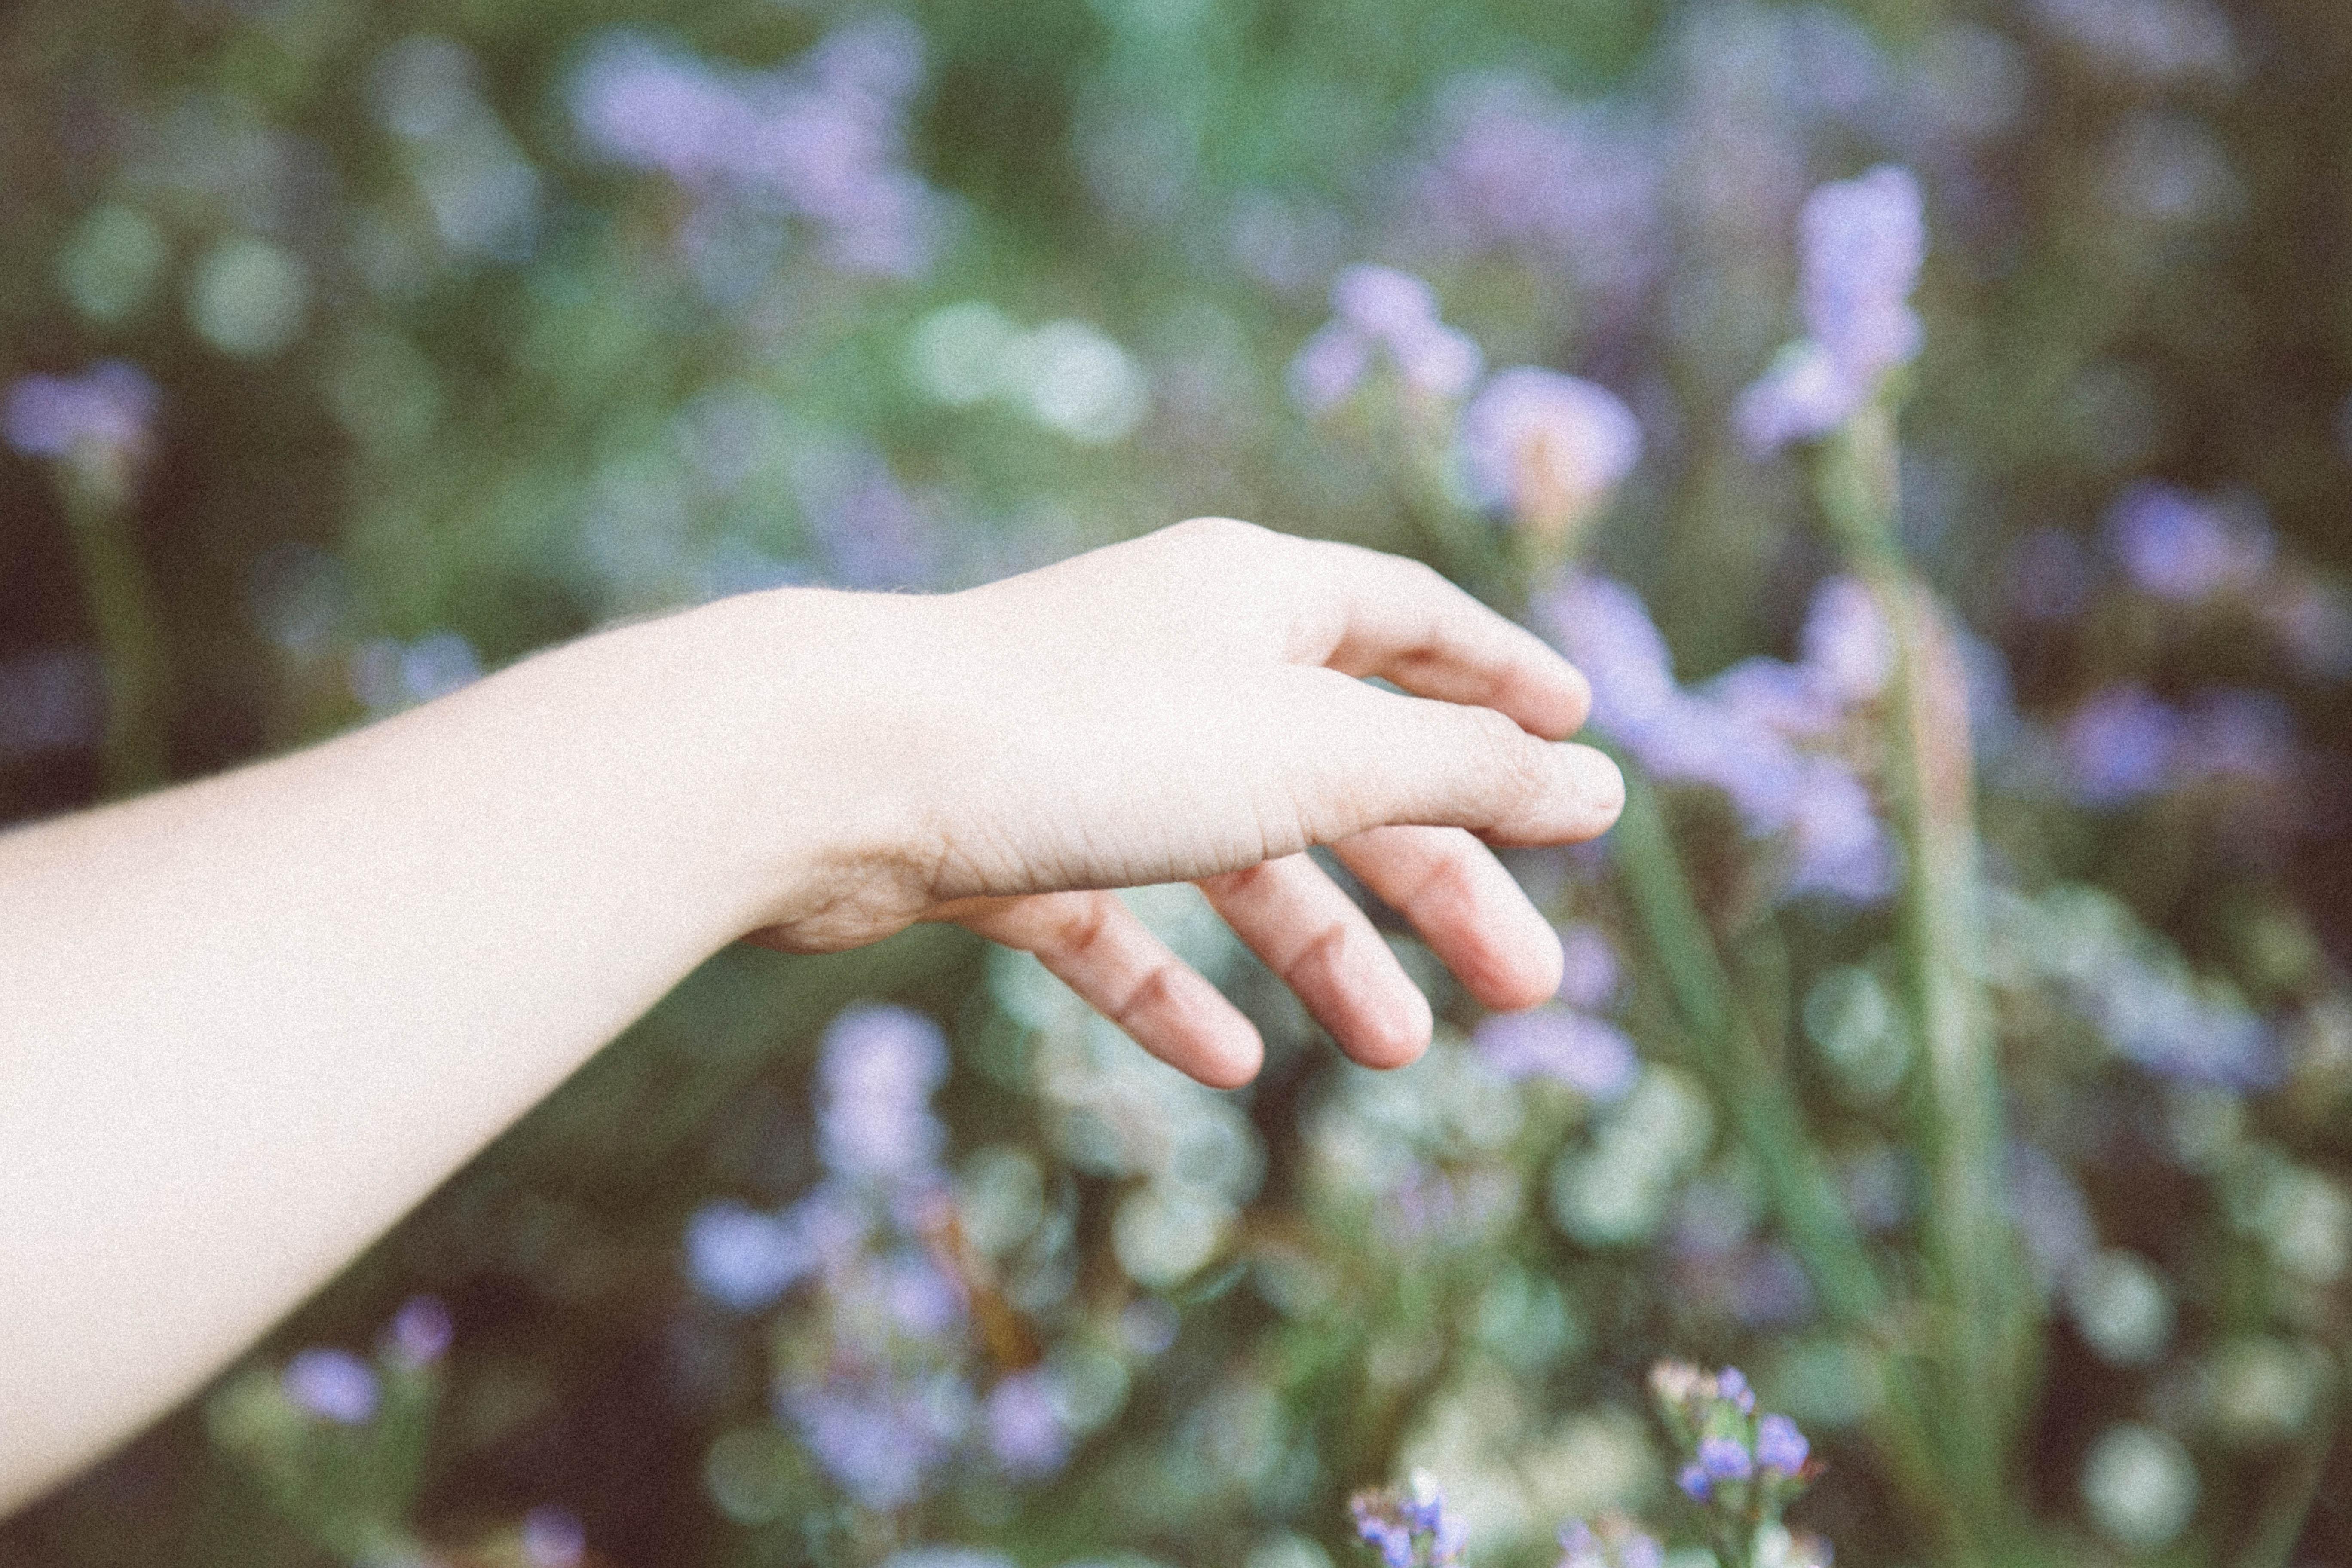 Hintergrundbilder : Hand, Finger, Nagel, Mädchen, Gras, Frühling ...